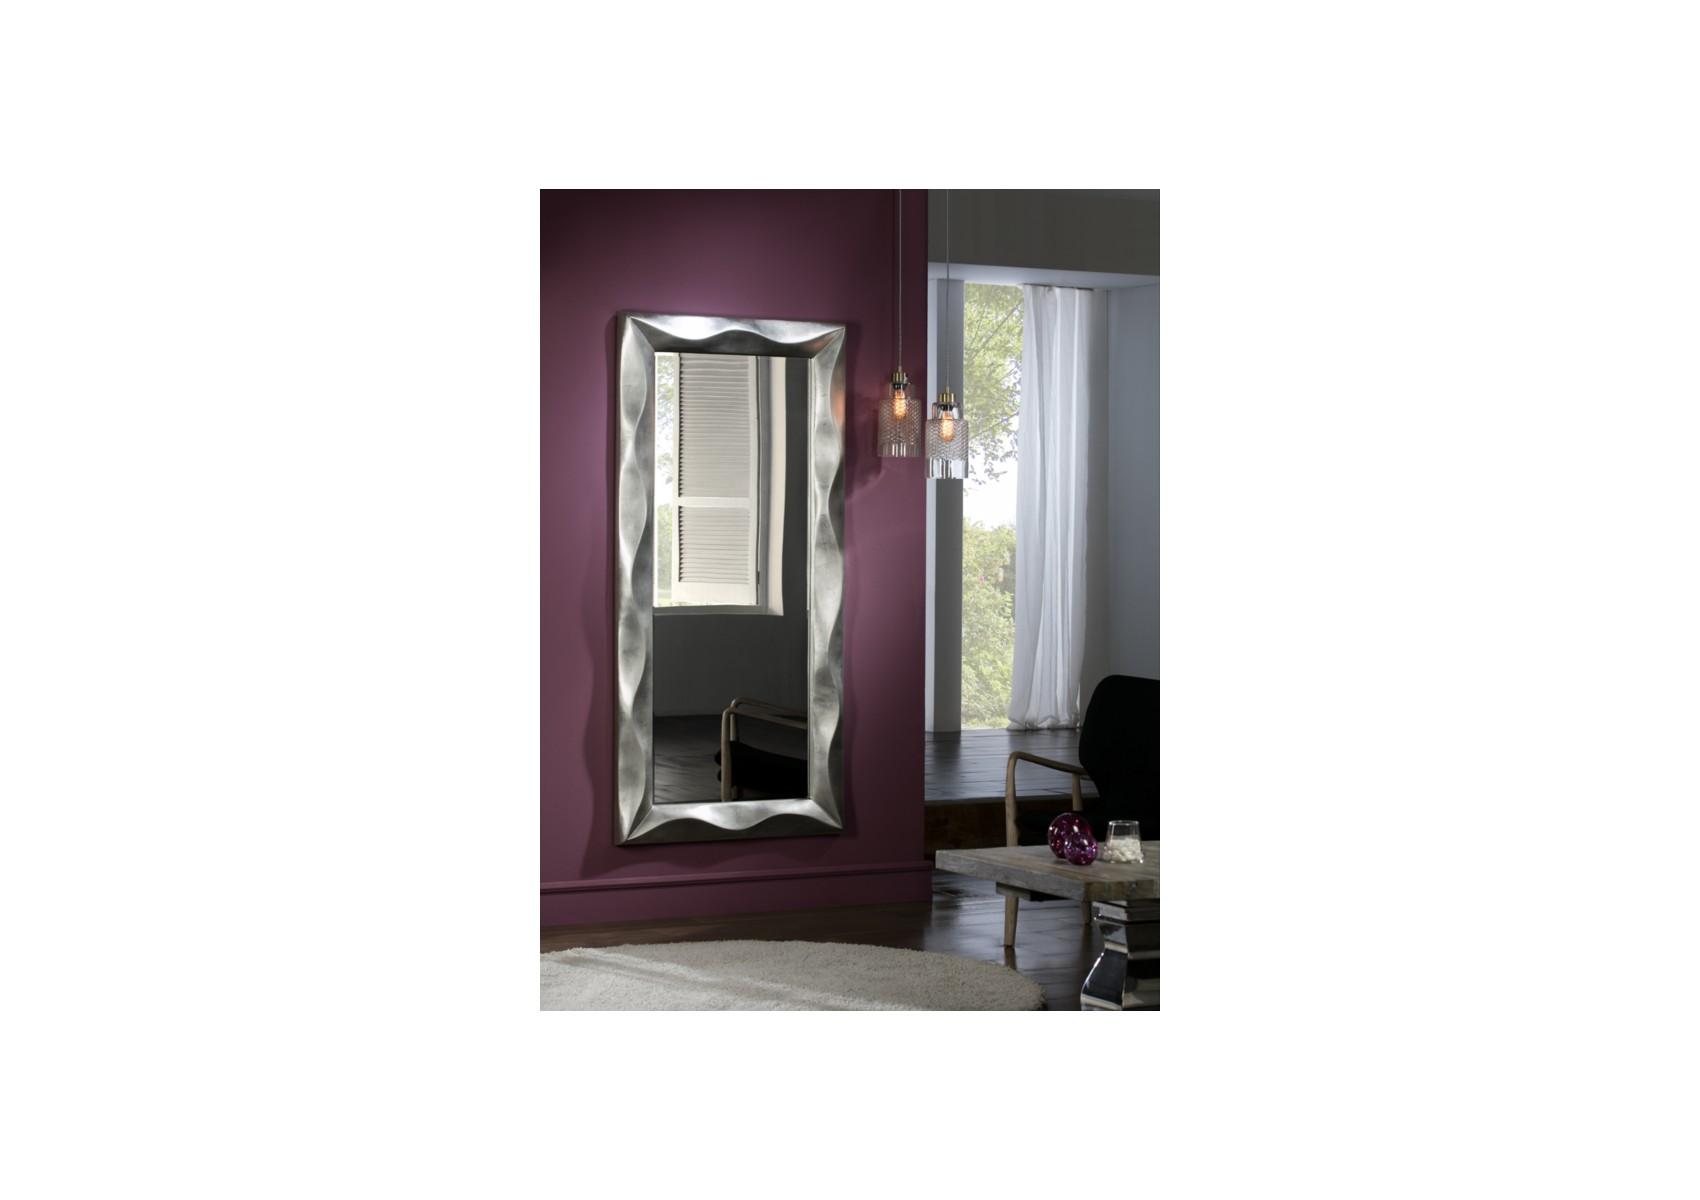 Miroir original design rectangulaire alboran boudoir for Miroir original